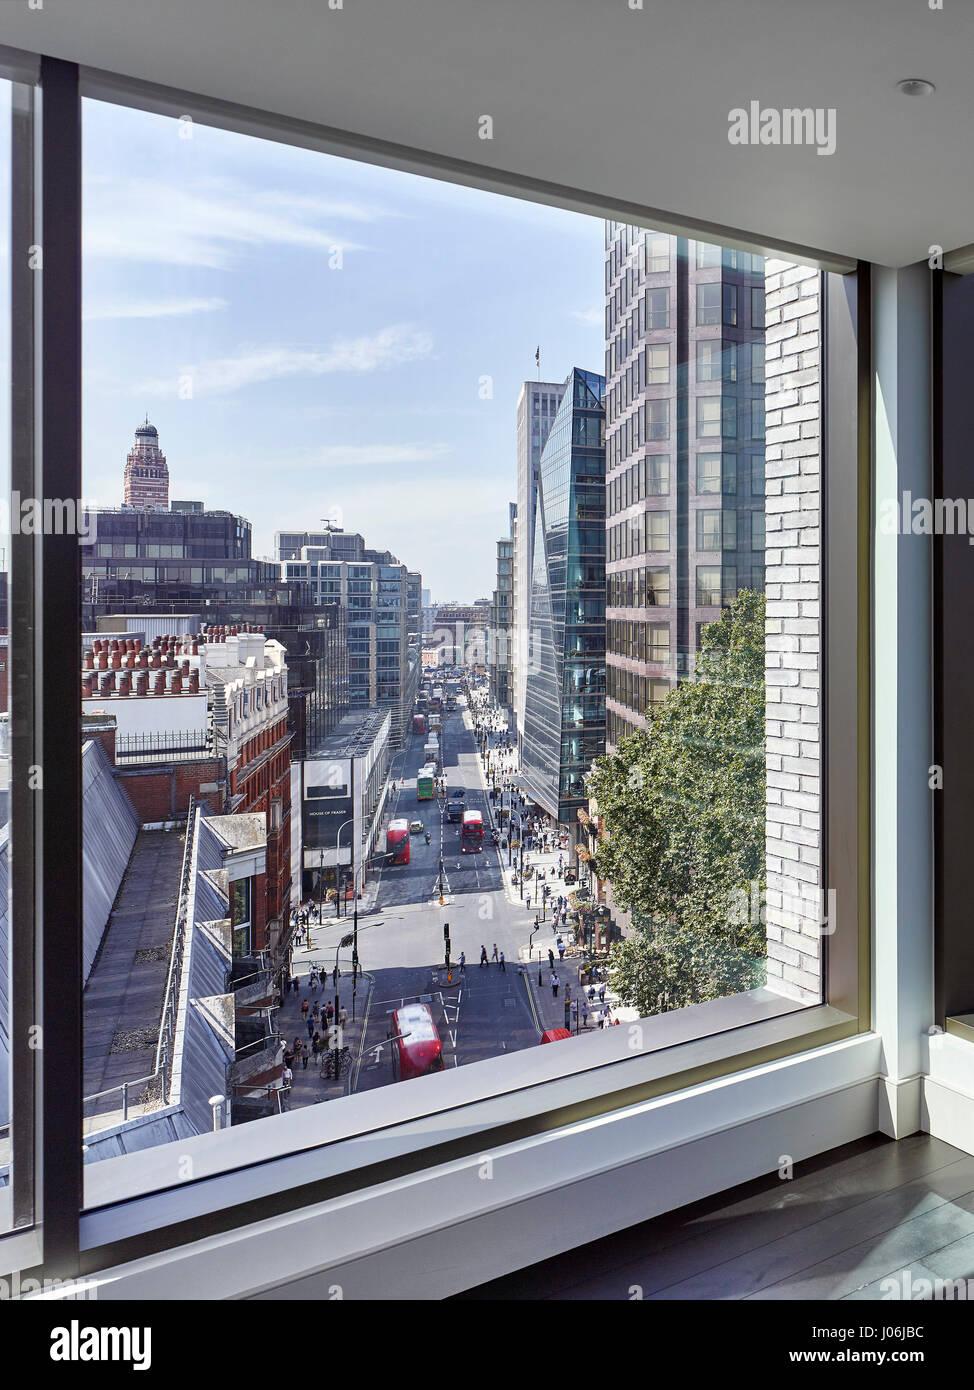 Framed view. 55 Victoria Street, London, United Kingdom. Architect: Stiff + Trevillion Architects, 2016. - Stock Image